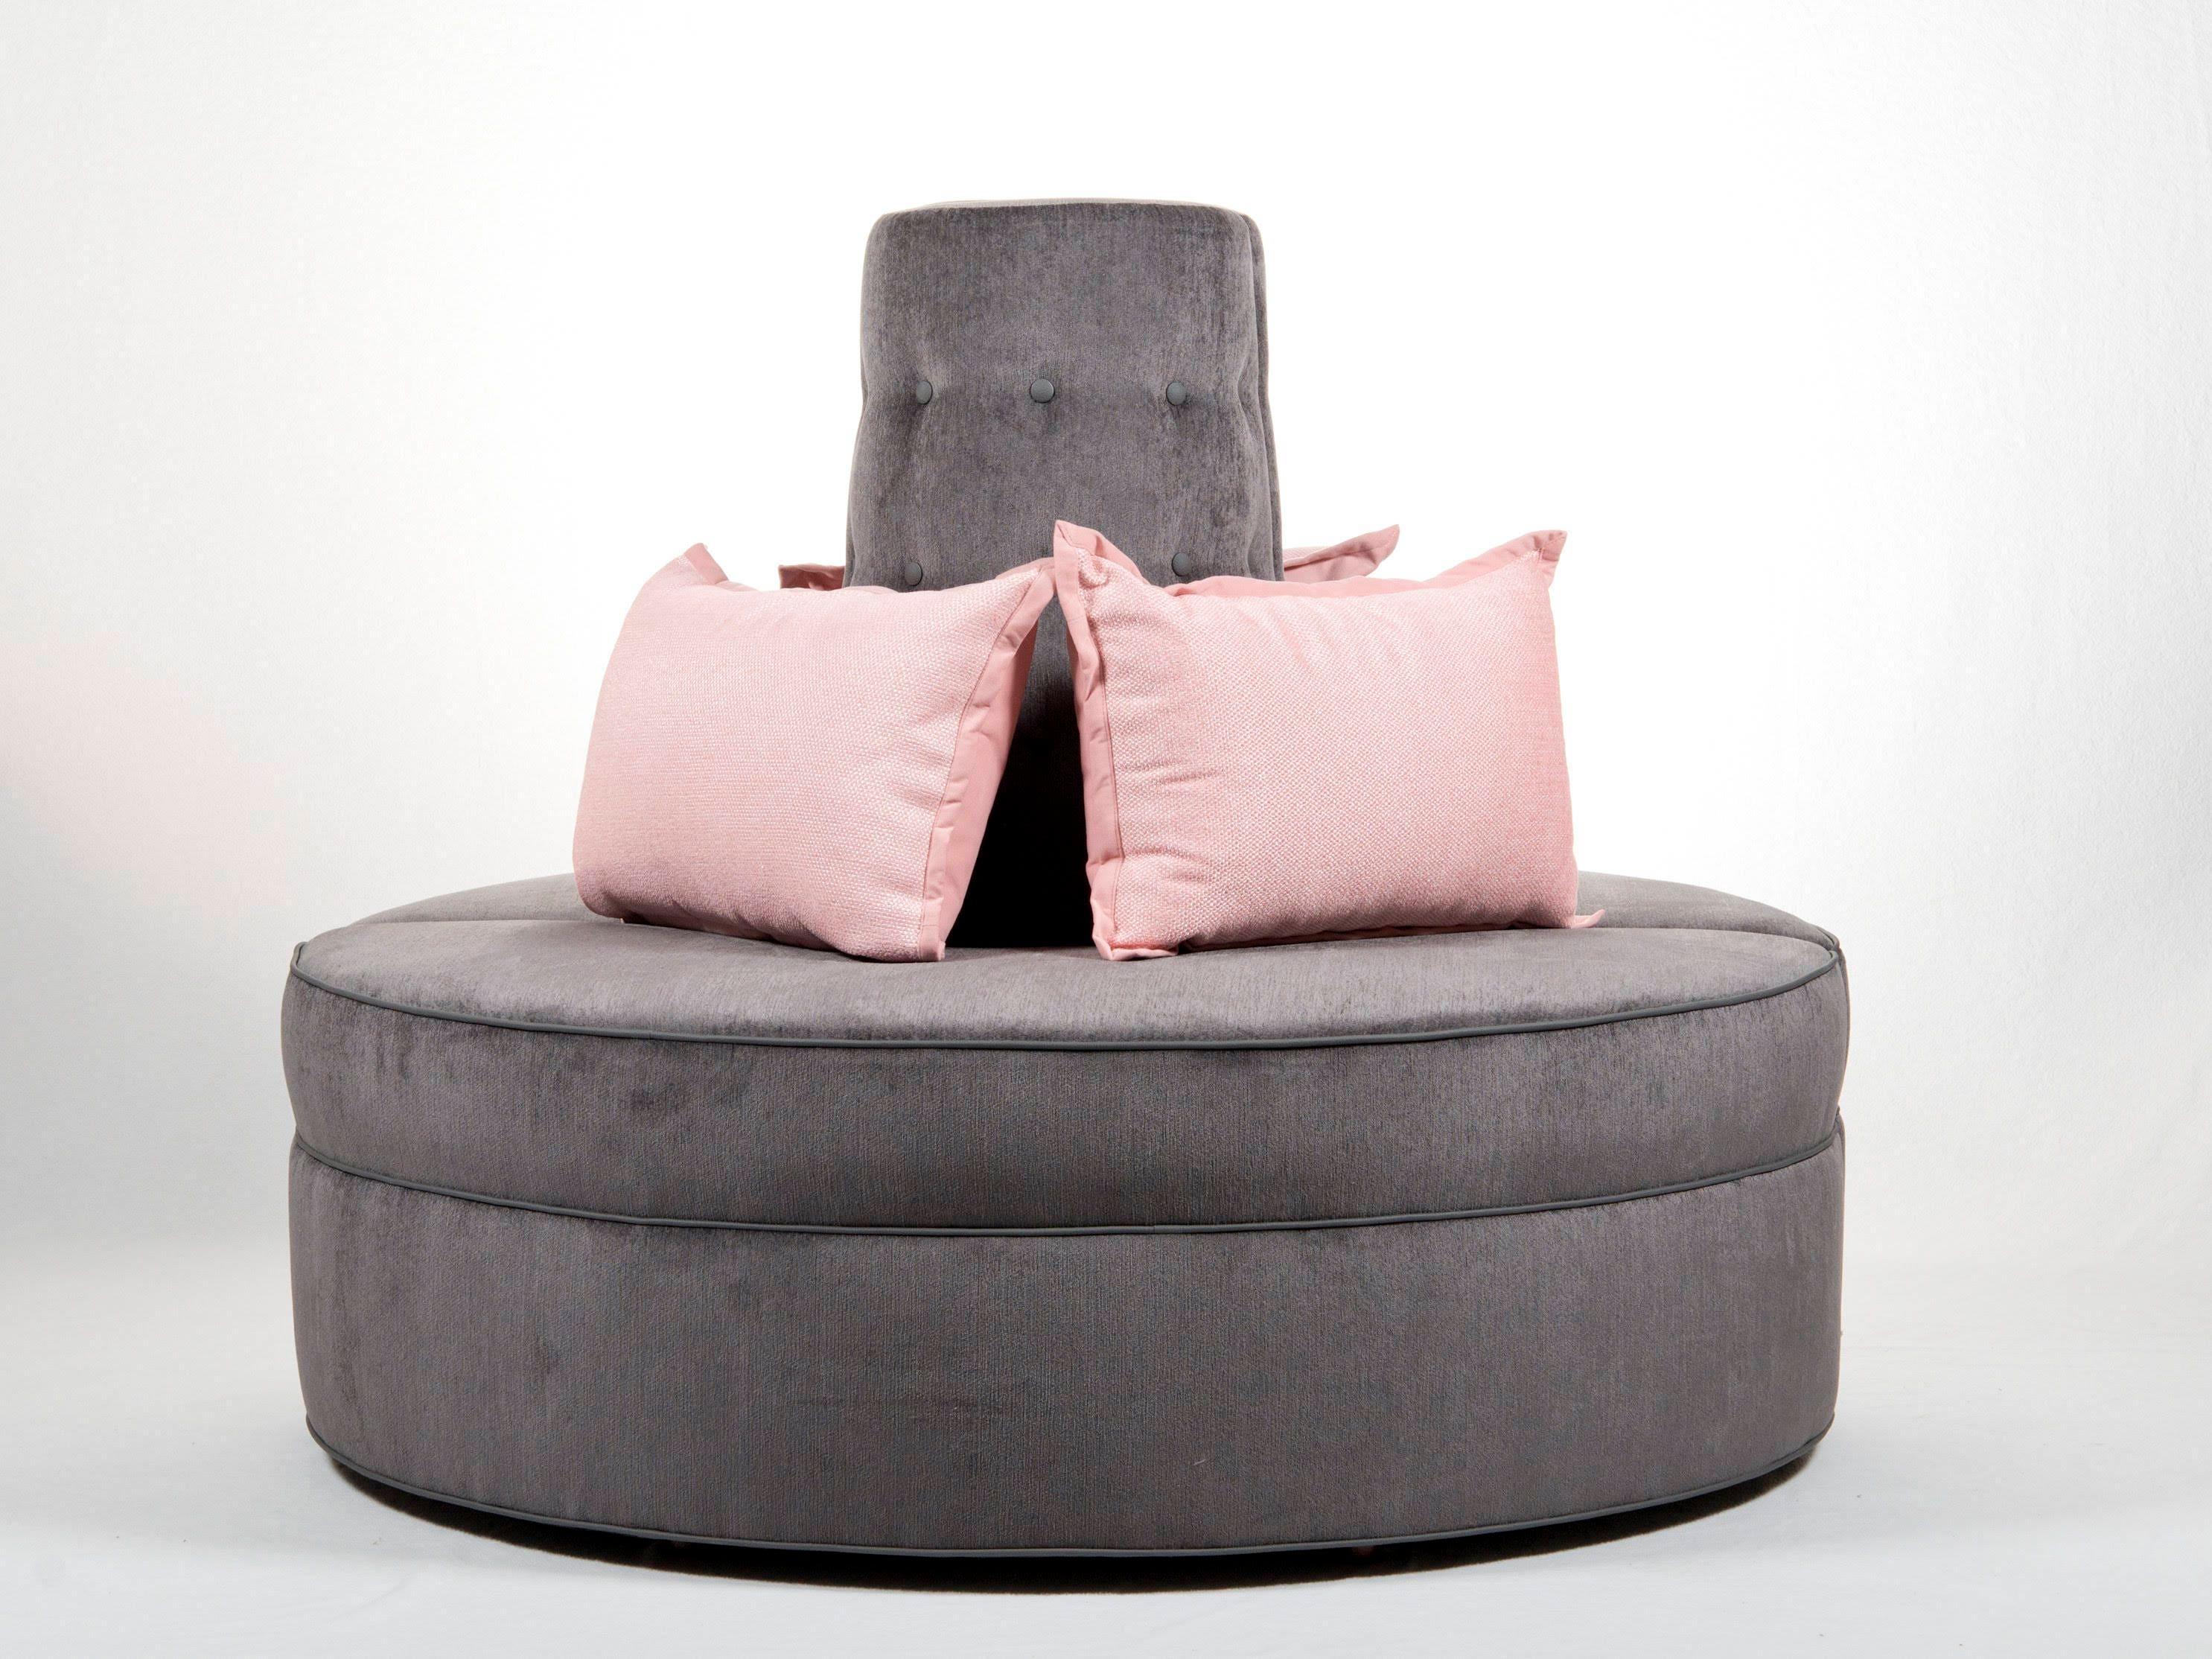 round banquette settee lobby sofa in gray chenille fabric etsy rh etsy com buy round lobby sofa